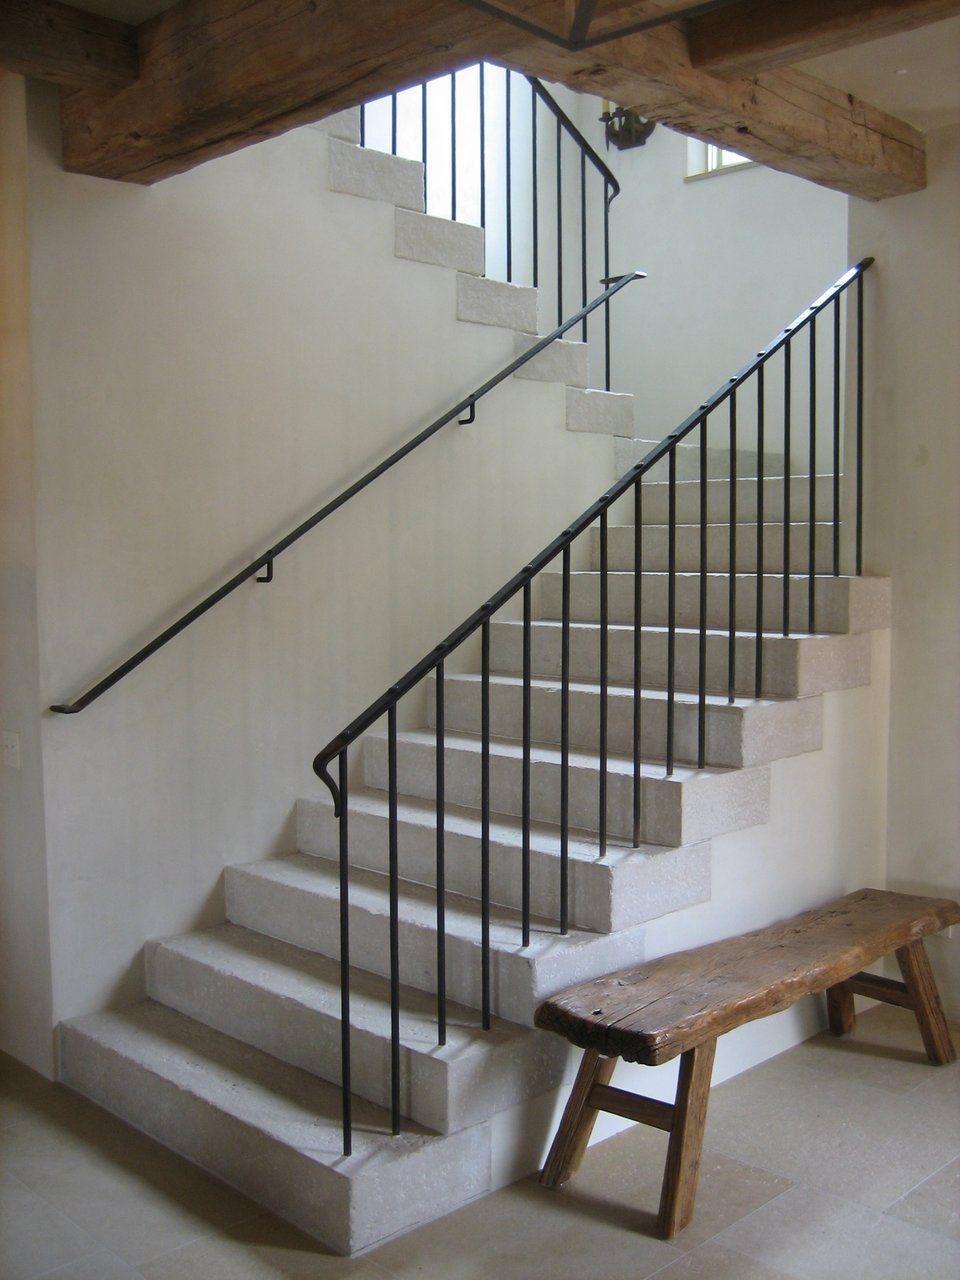 Best Pedernales Ryan Street Associates Forged Iron Railing Stair Railing Design Wrought Iron 400 x 300